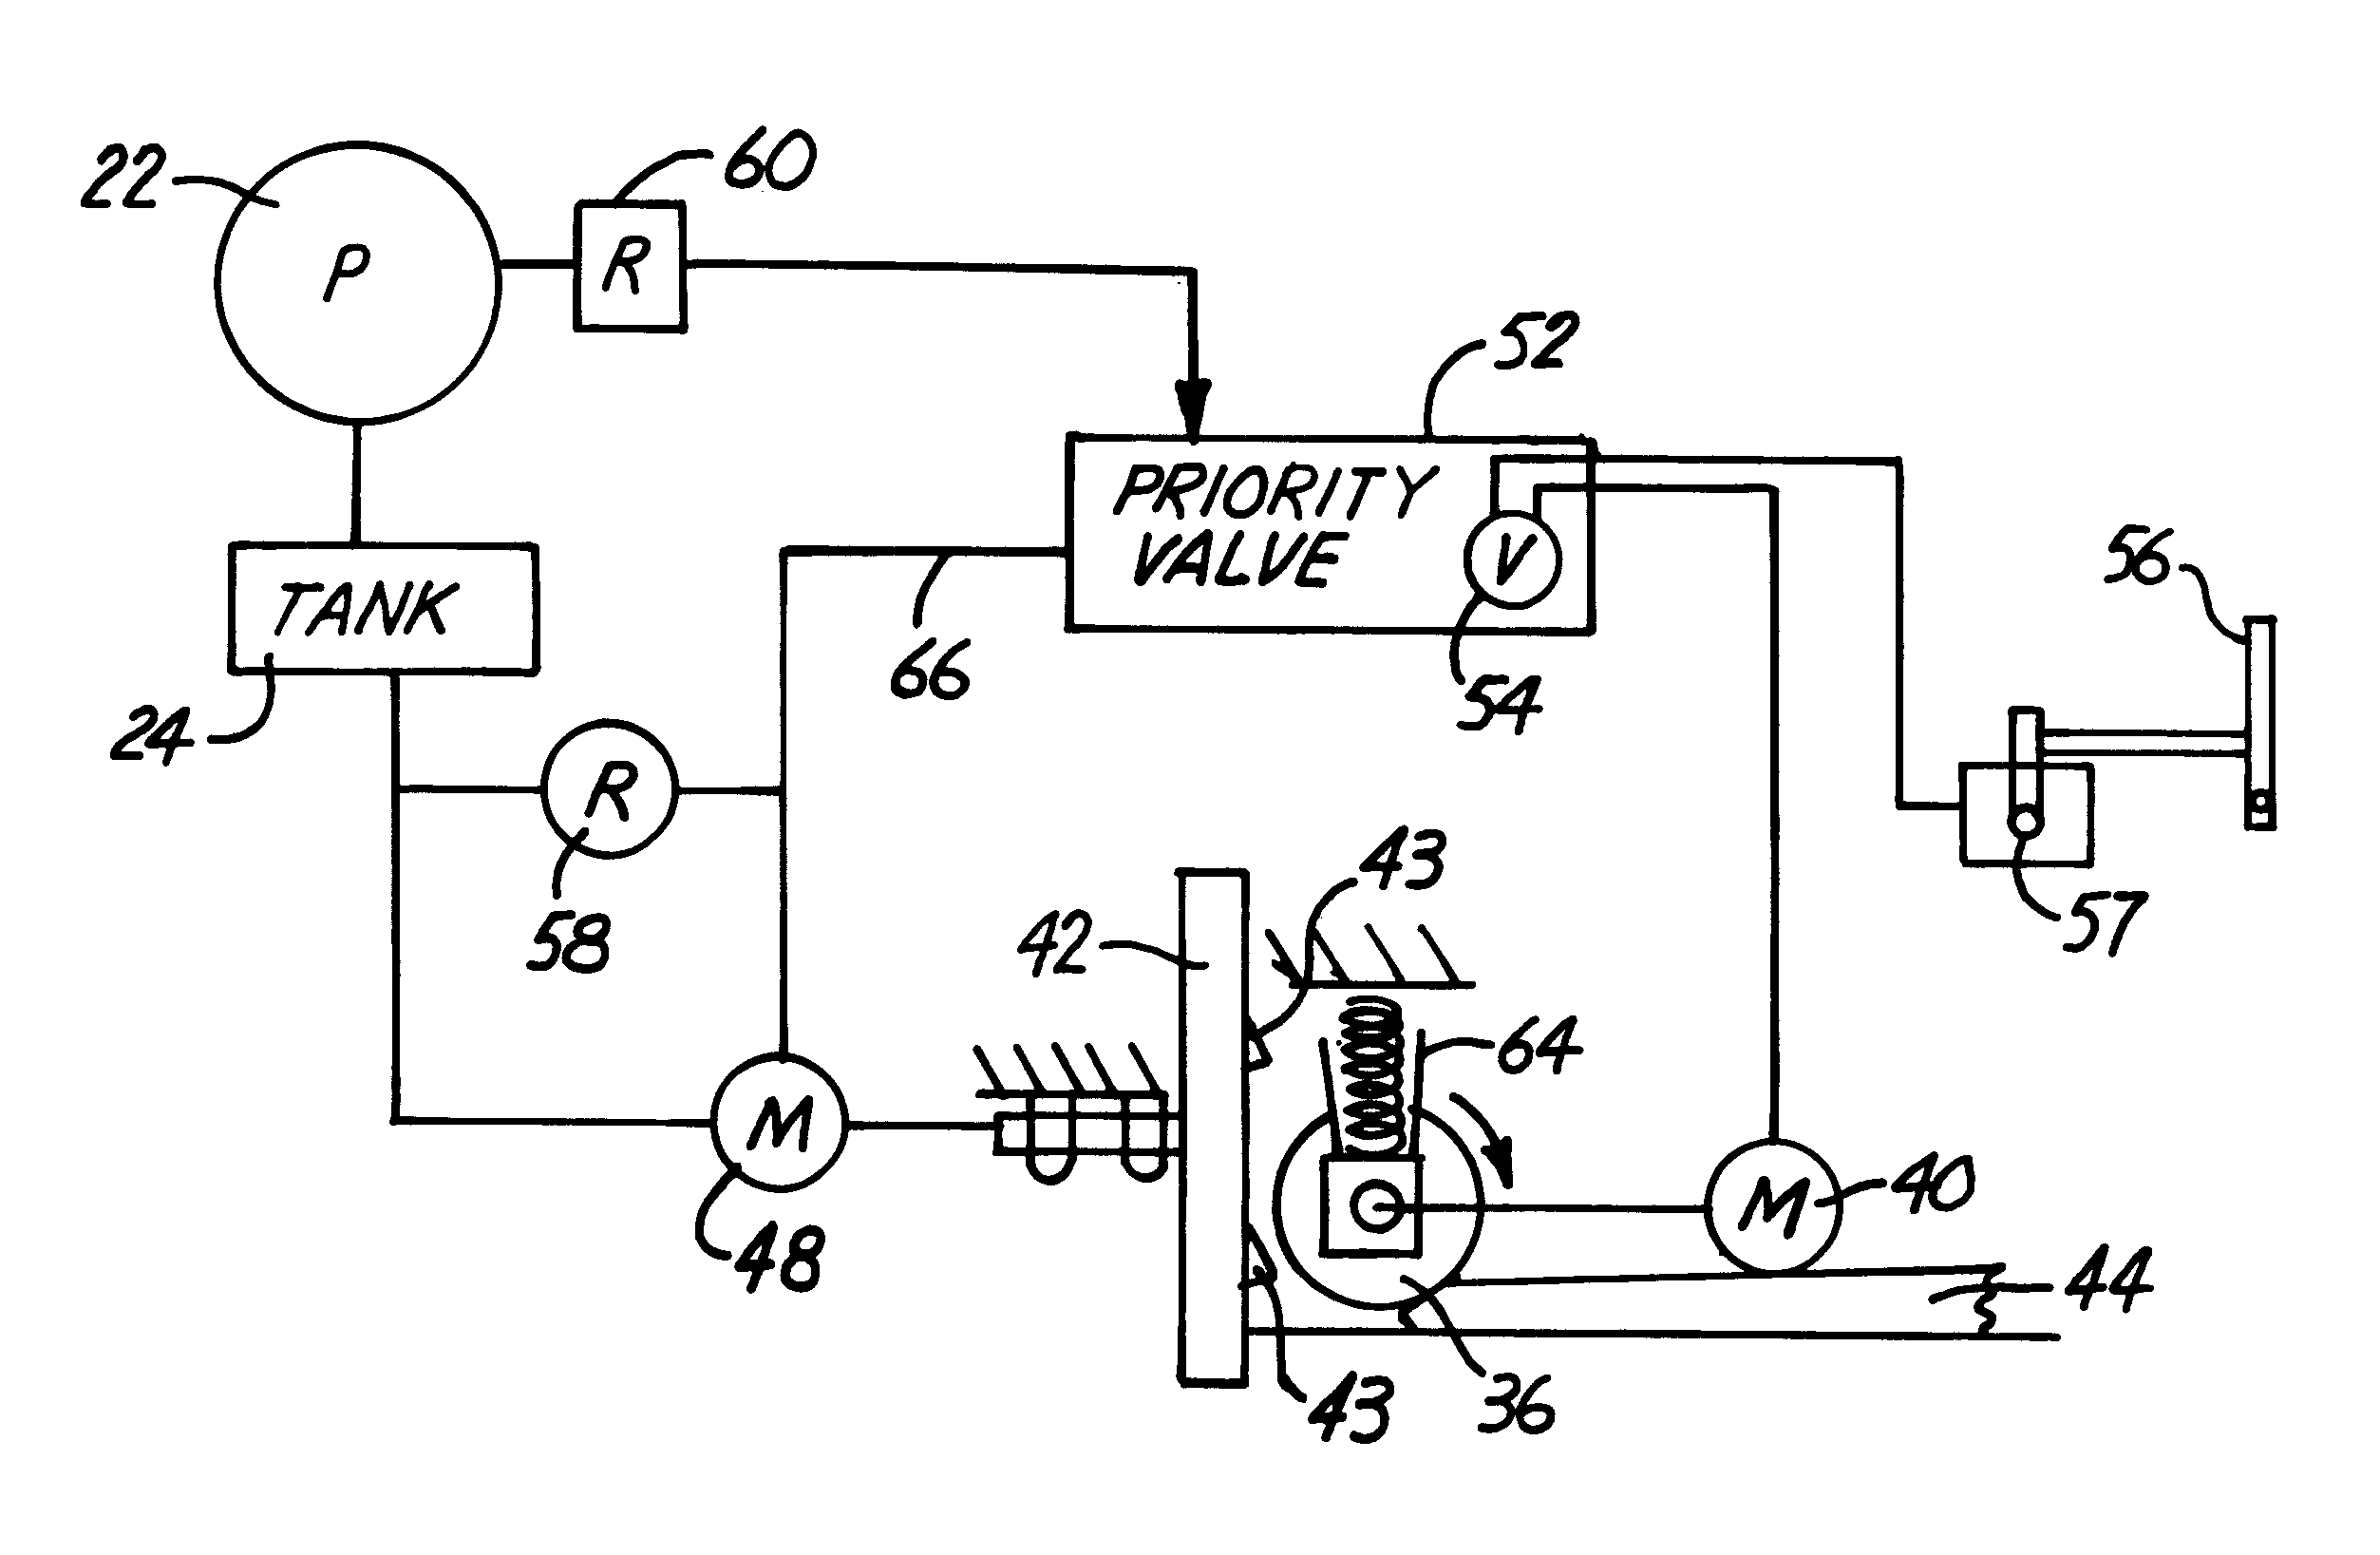 vermeer stump grinder fuel filter